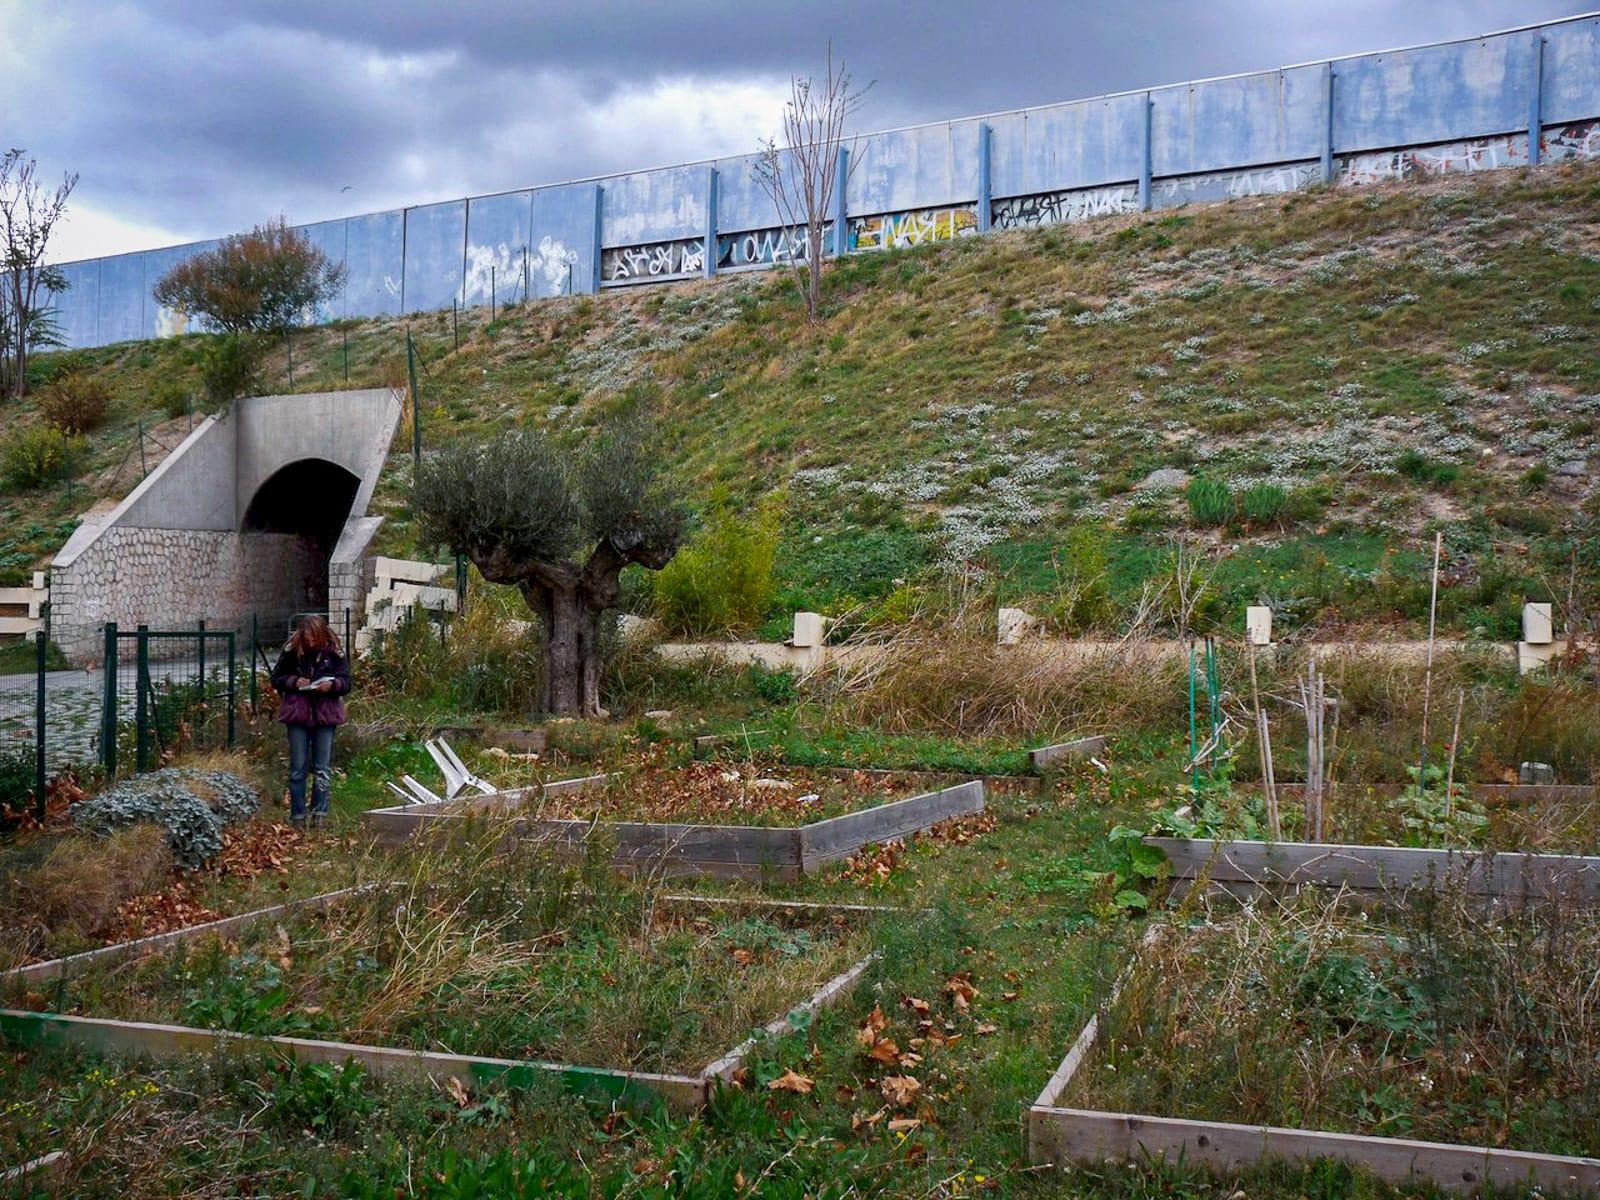 Frange ville nature Marseille jardins partages®Hermeline Carpentier